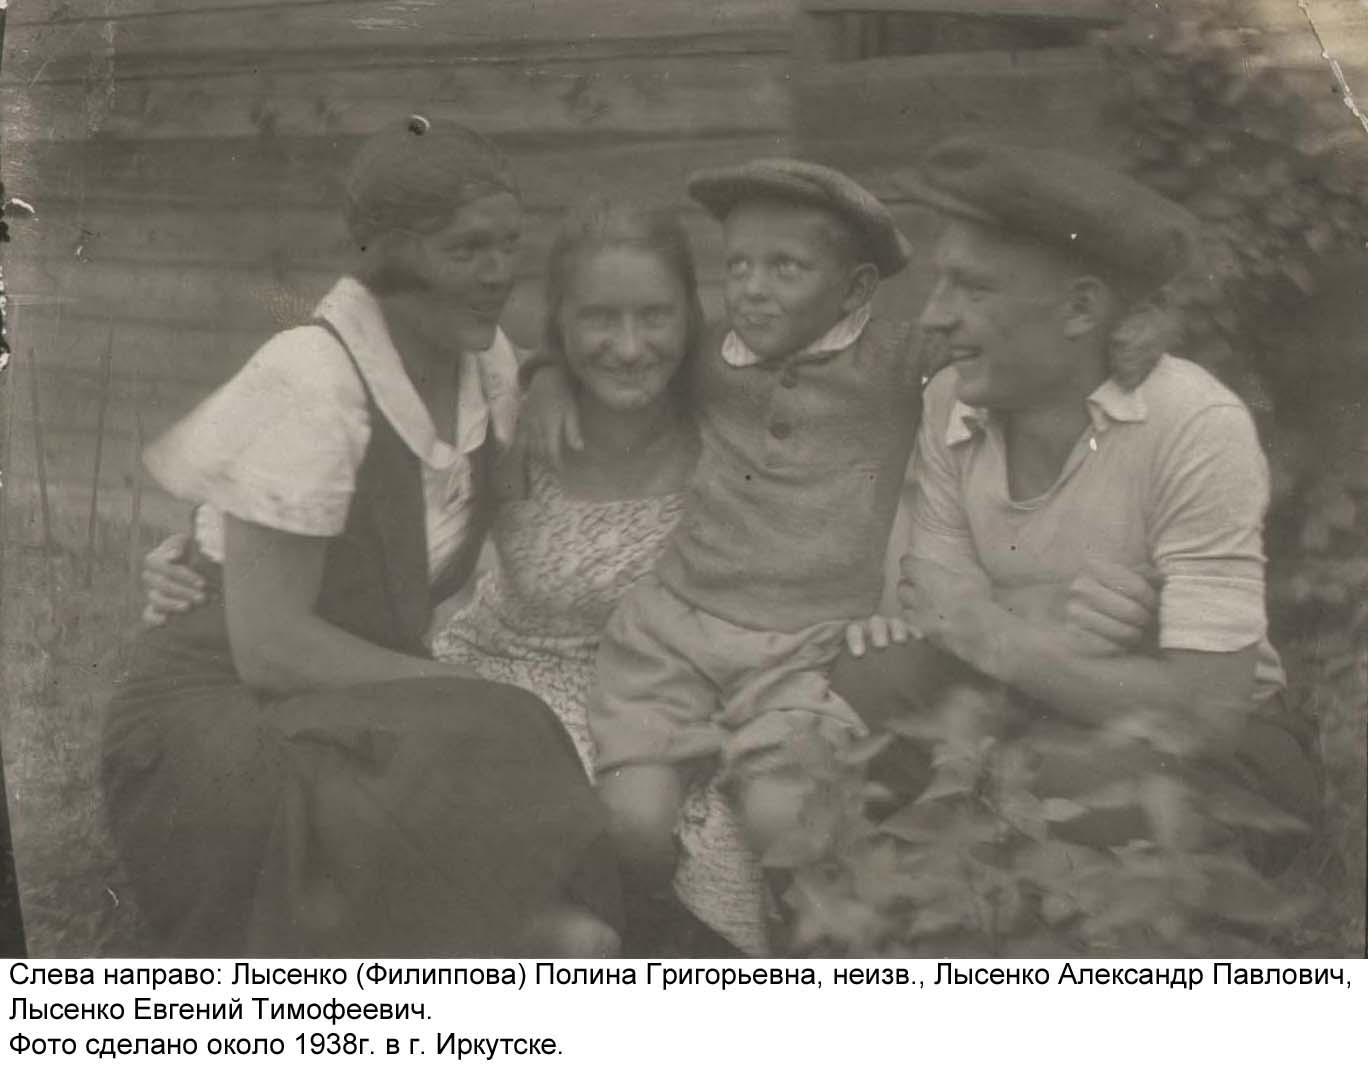 Слева направо: Лысенко (Филиппова) Полина Григорьевна, неизв., Лысенко Александр Павлович, Лысенко Евгений Тимофеевич. Фото сделано около 1938 г. в Иркутске